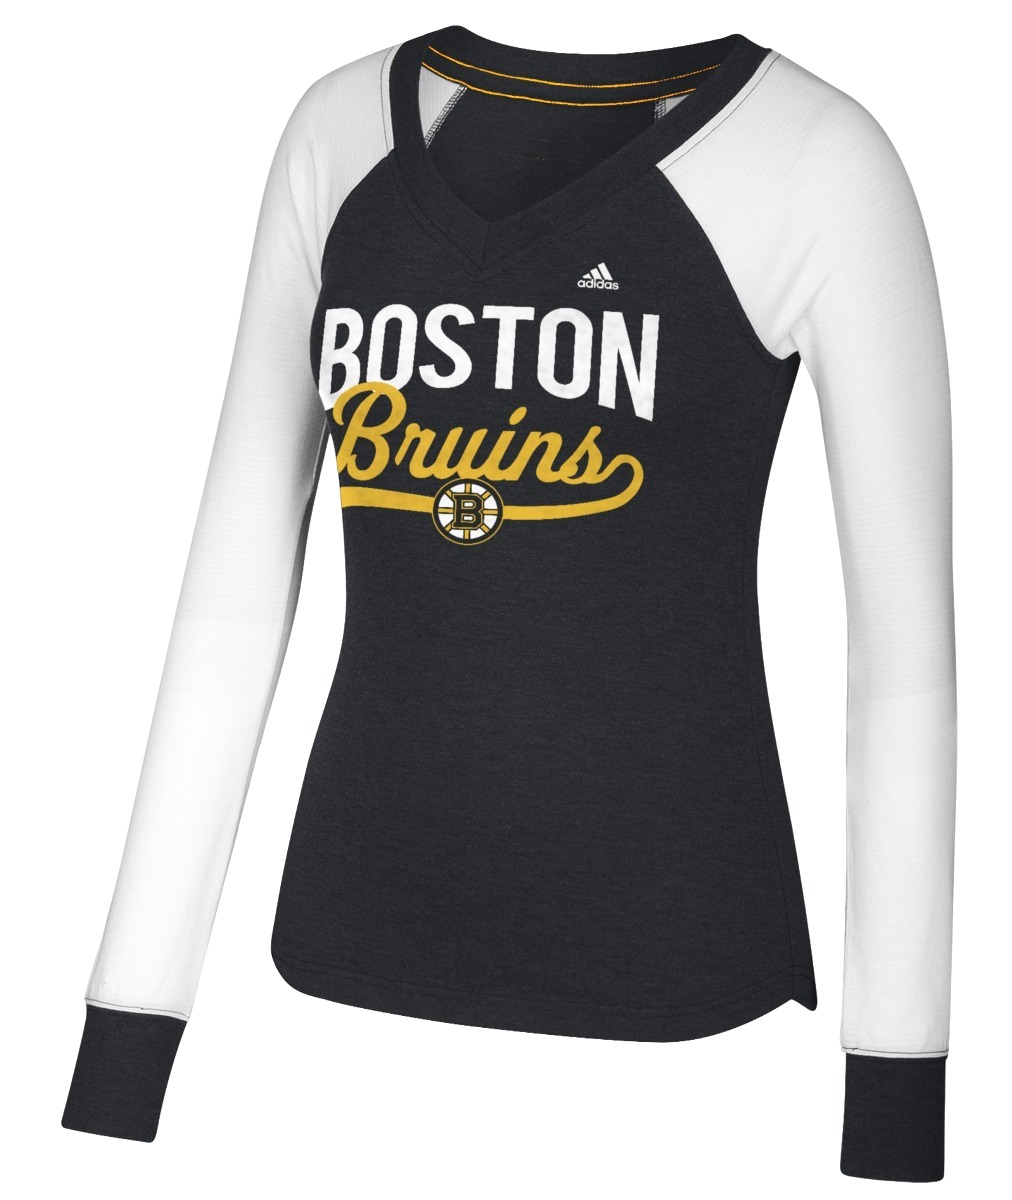 "Boston Bruins Women's Adidas NHL ""Puck Drop"" Dual Blend Long Sleeve T-shirt by REEBOK/SPORTS LICENSED DIVISION"